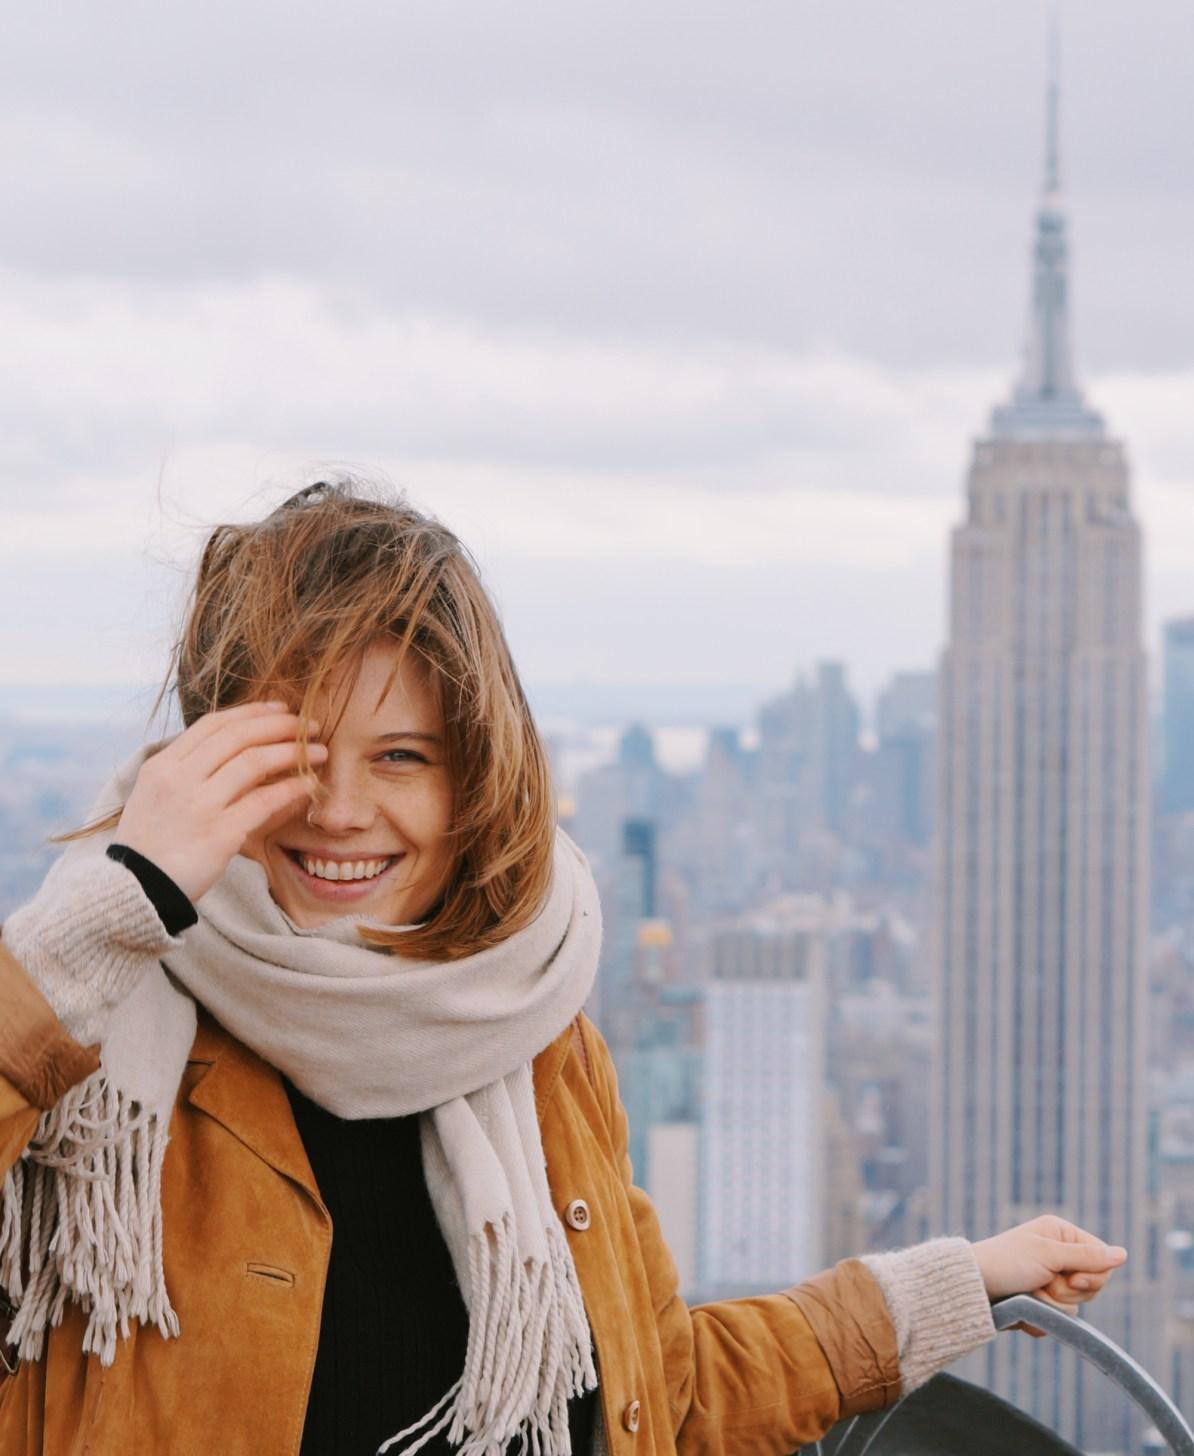 Carina i New York, 2017 - Carina Behrens, carinabehrens.com